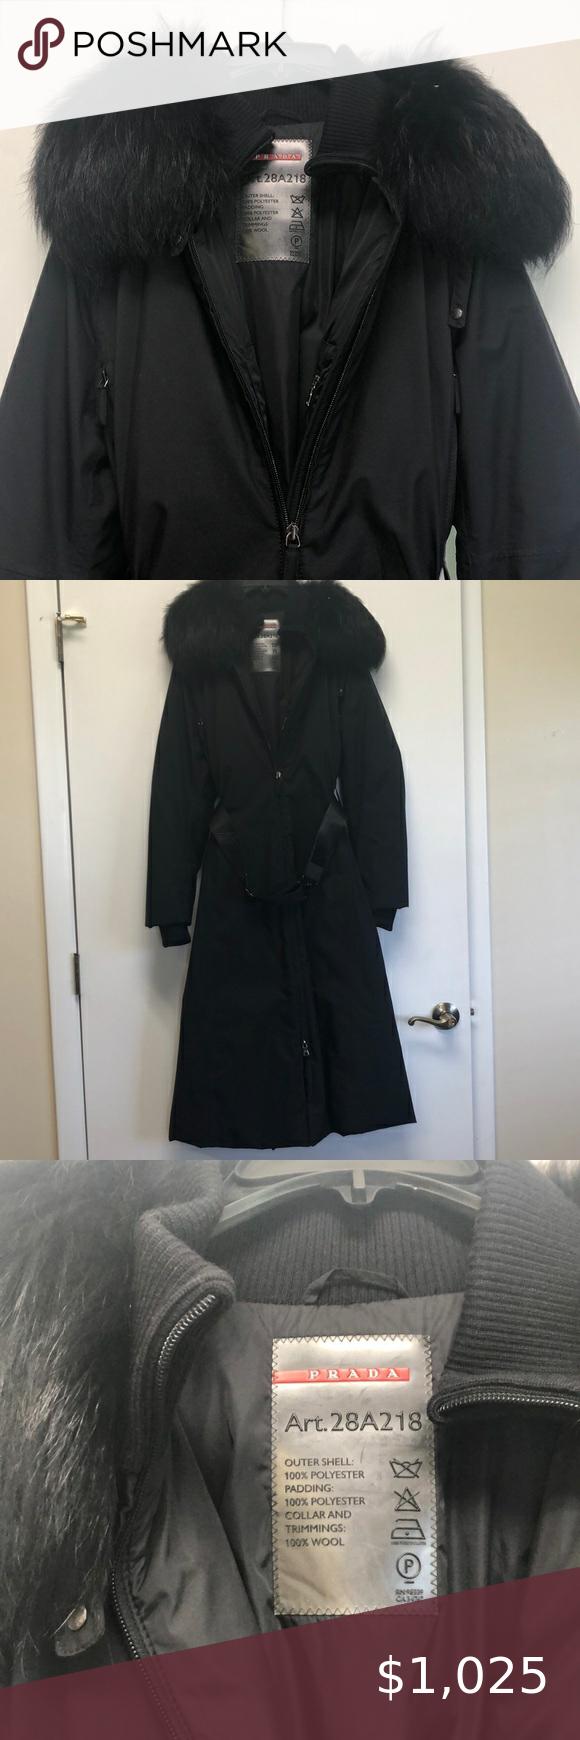 Prada Long Coat Long Coat Prada Coat Coat [ 1740 x 580 Pixel ]